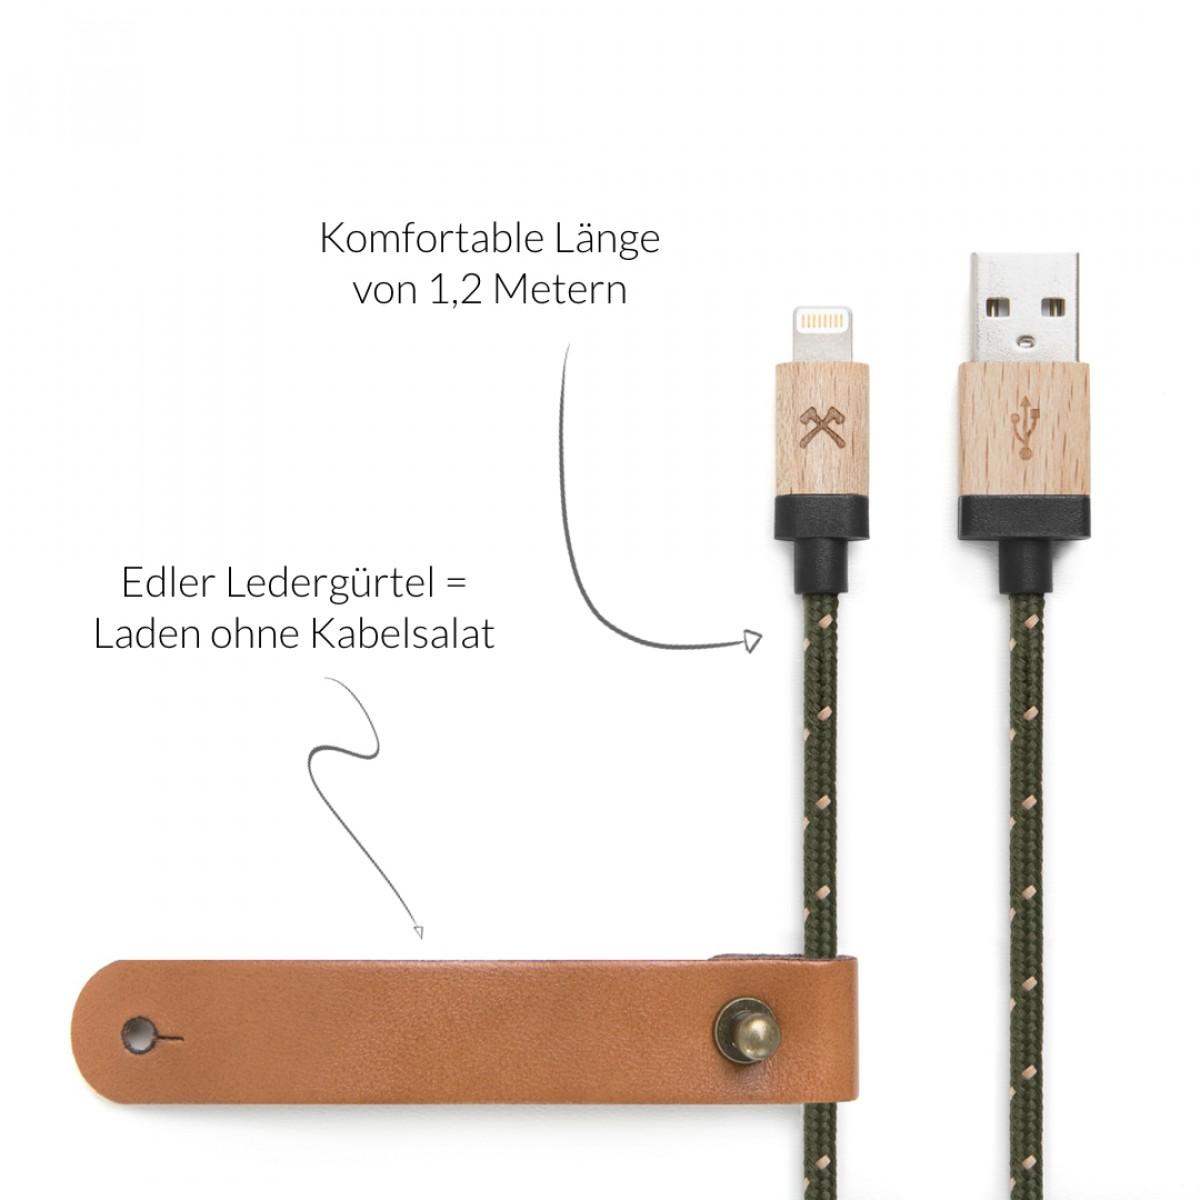 Woodcessories - EcoCable - Design Ladekabel, Kabel (Mfi Apple zert.) für Apple Lightning Produkte aus FSC-zert. Holz & Nylon (Ahorn, grün-braun)